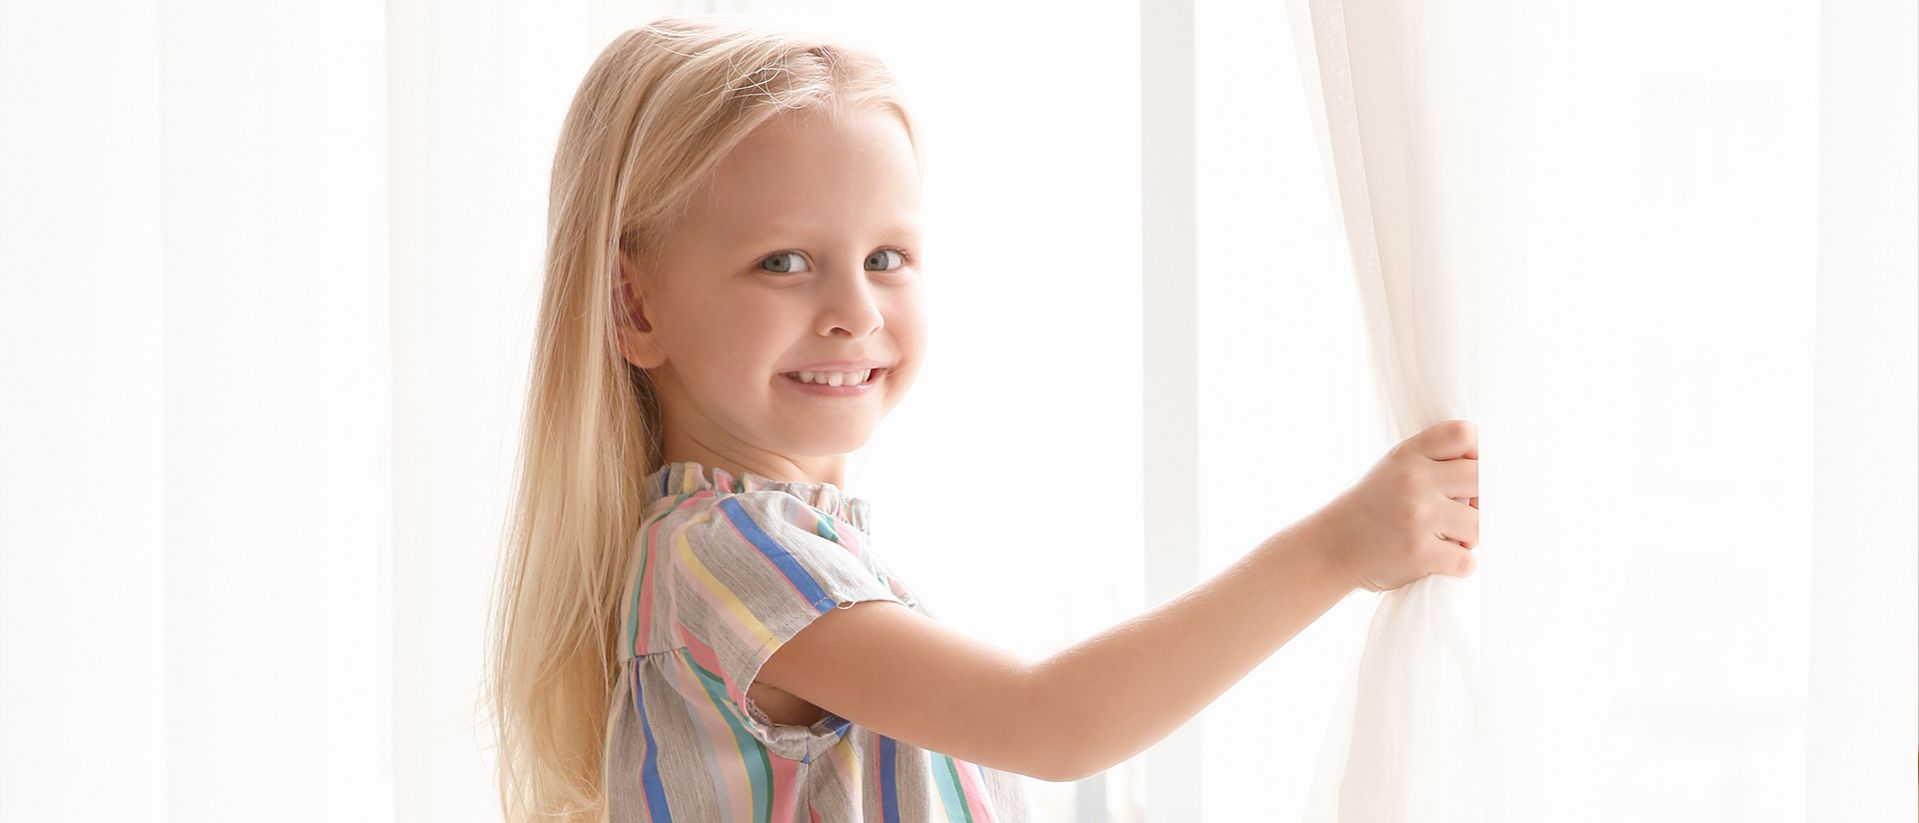 Regole anti-smog per respirare aria pulita in casa